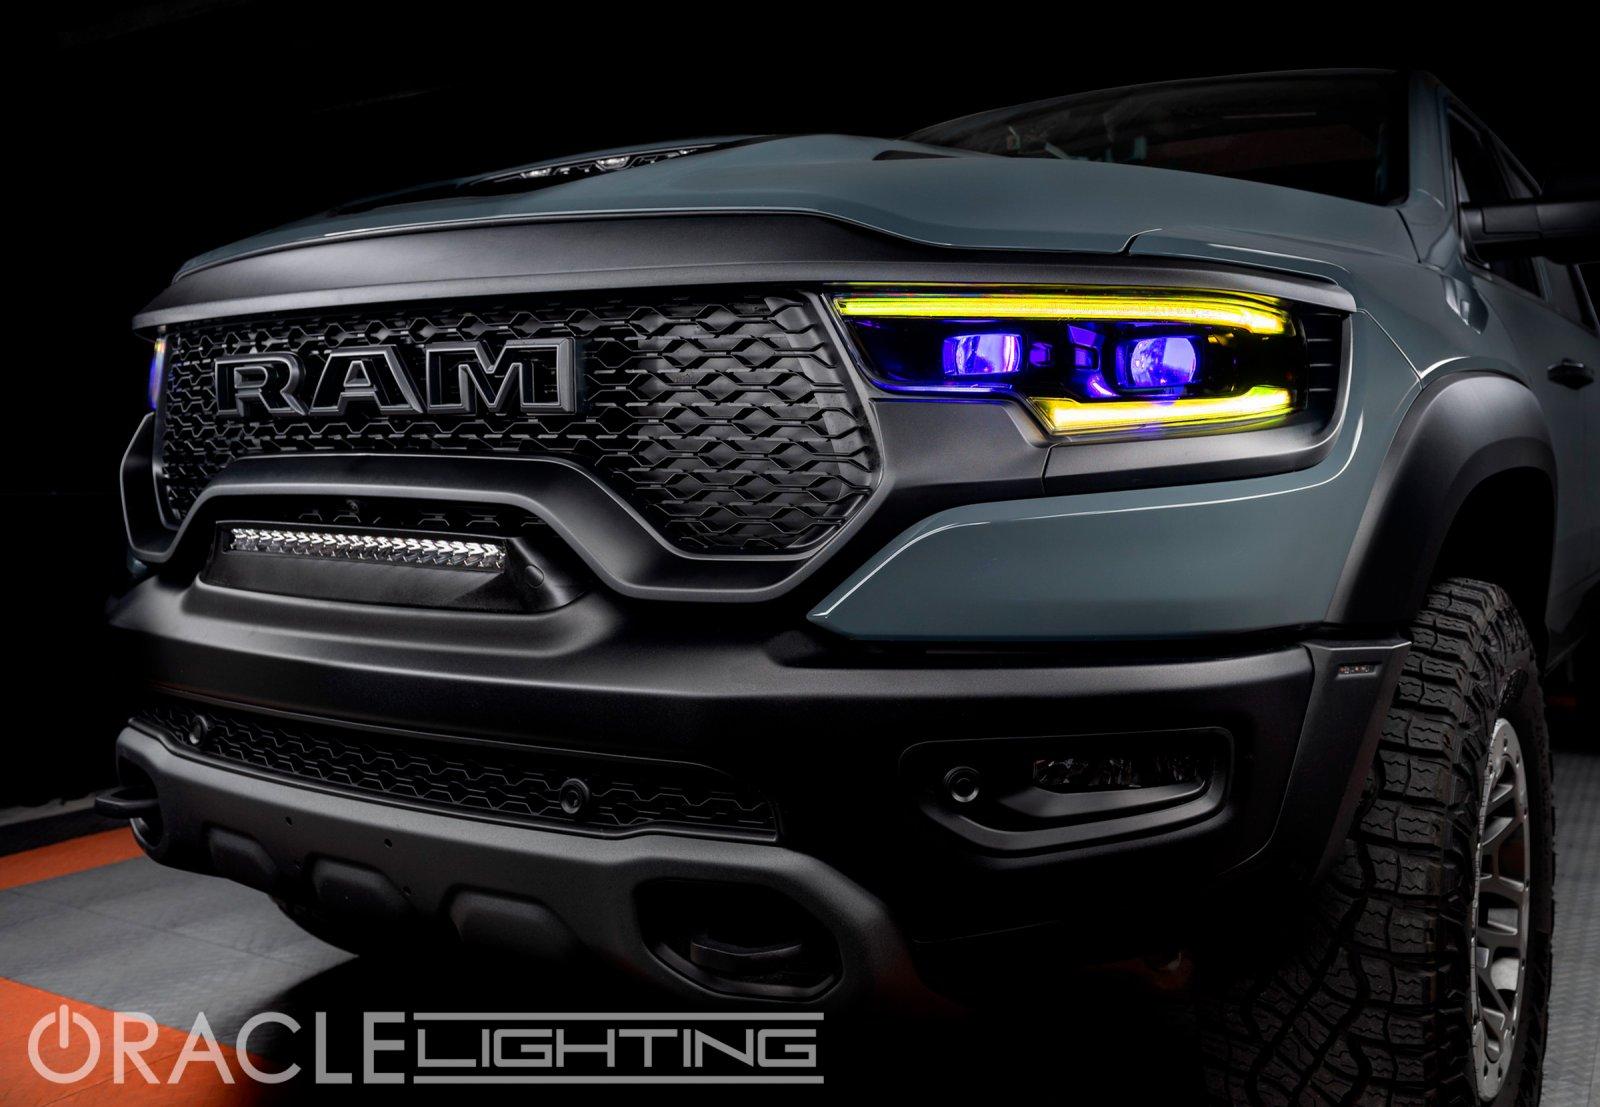 oracle_lighting_ram_trx_colorshift_headlights-2.jpg